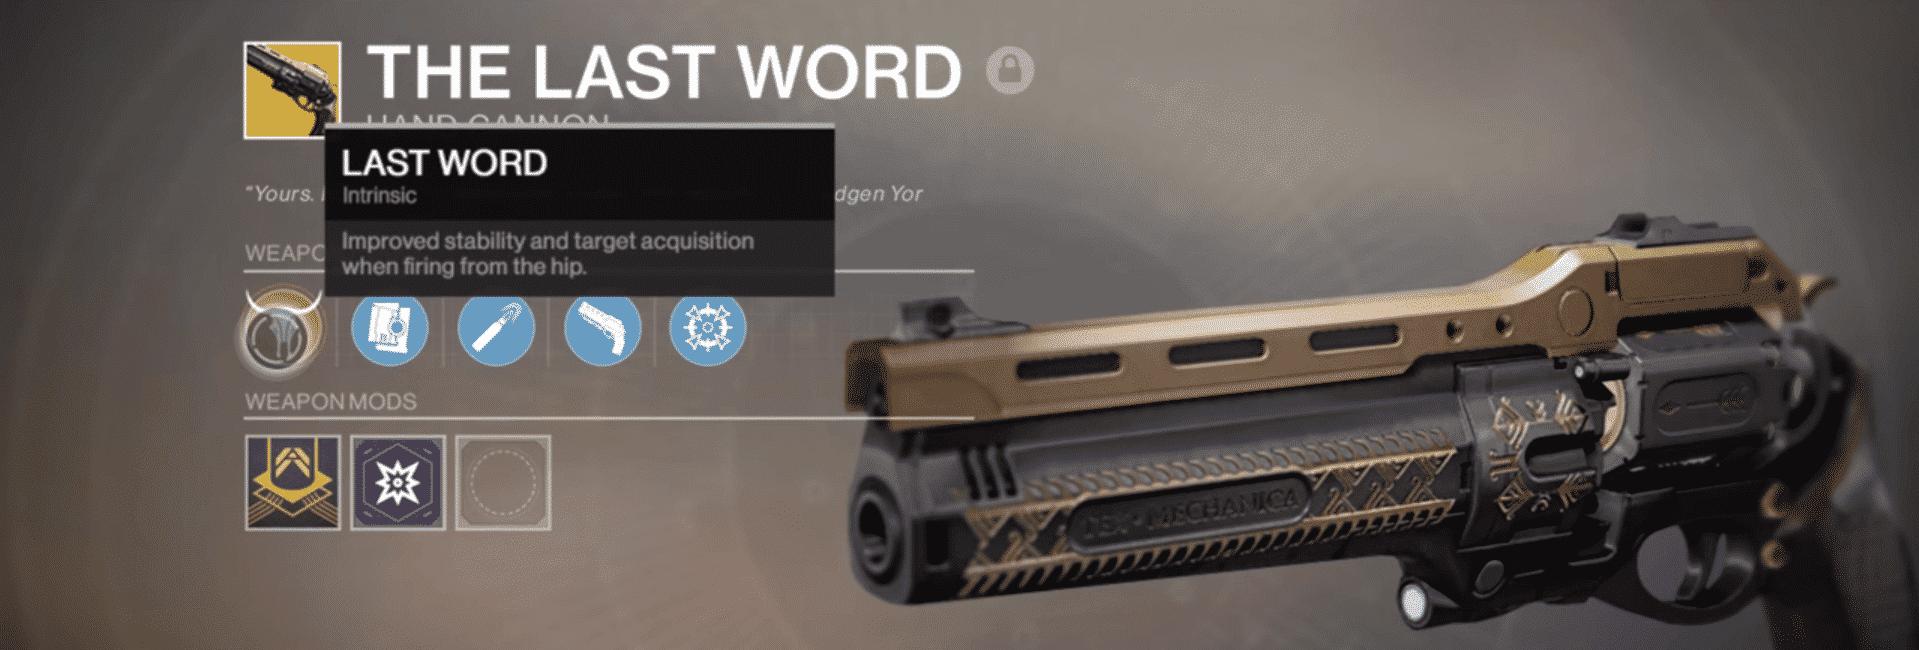 3 last word carry recov 3